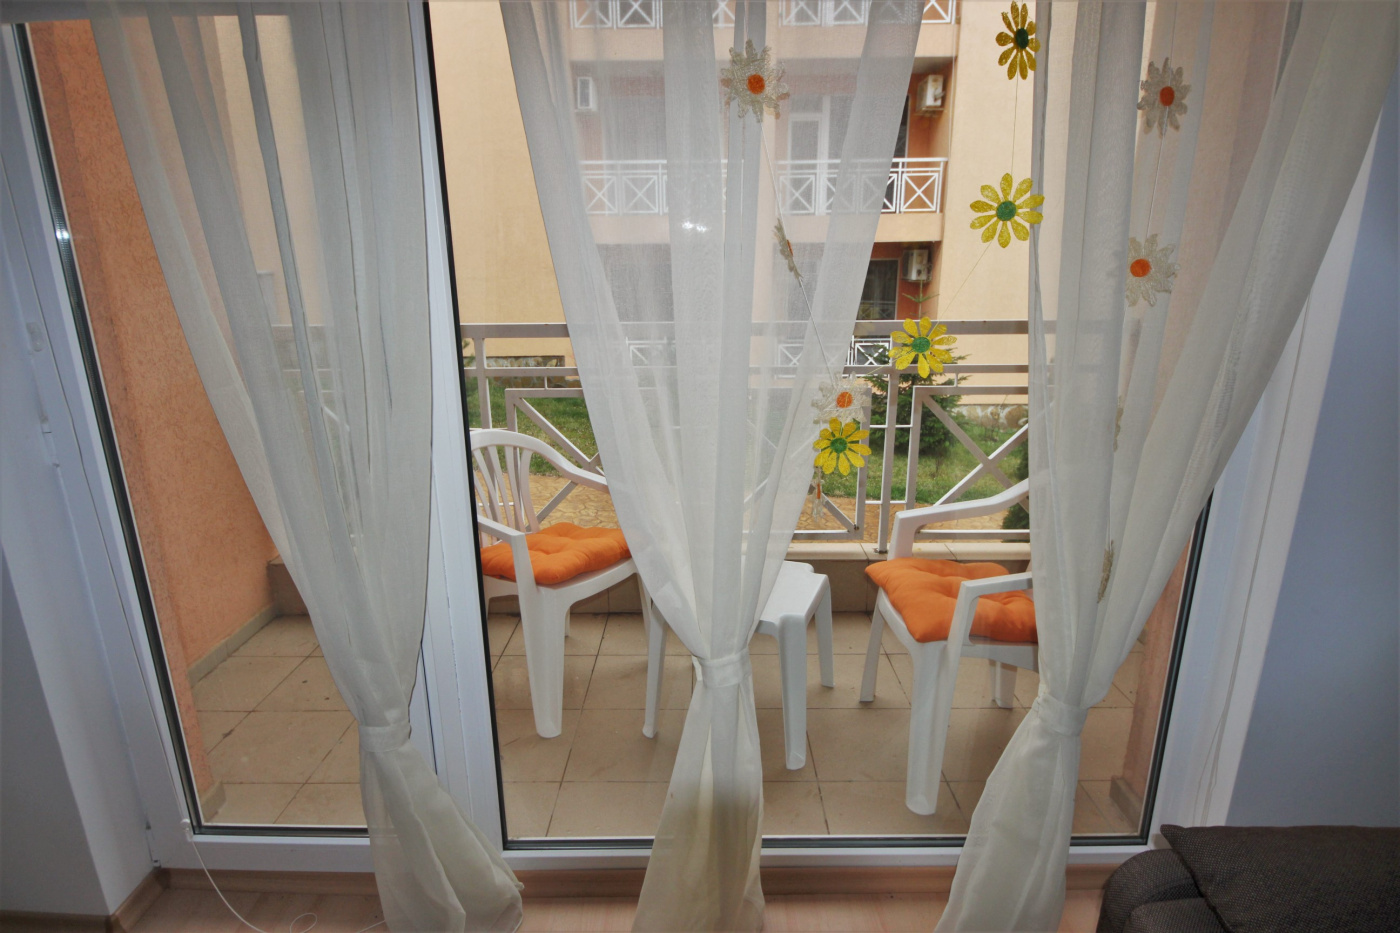 Sunny Day 6 apartament 18.3